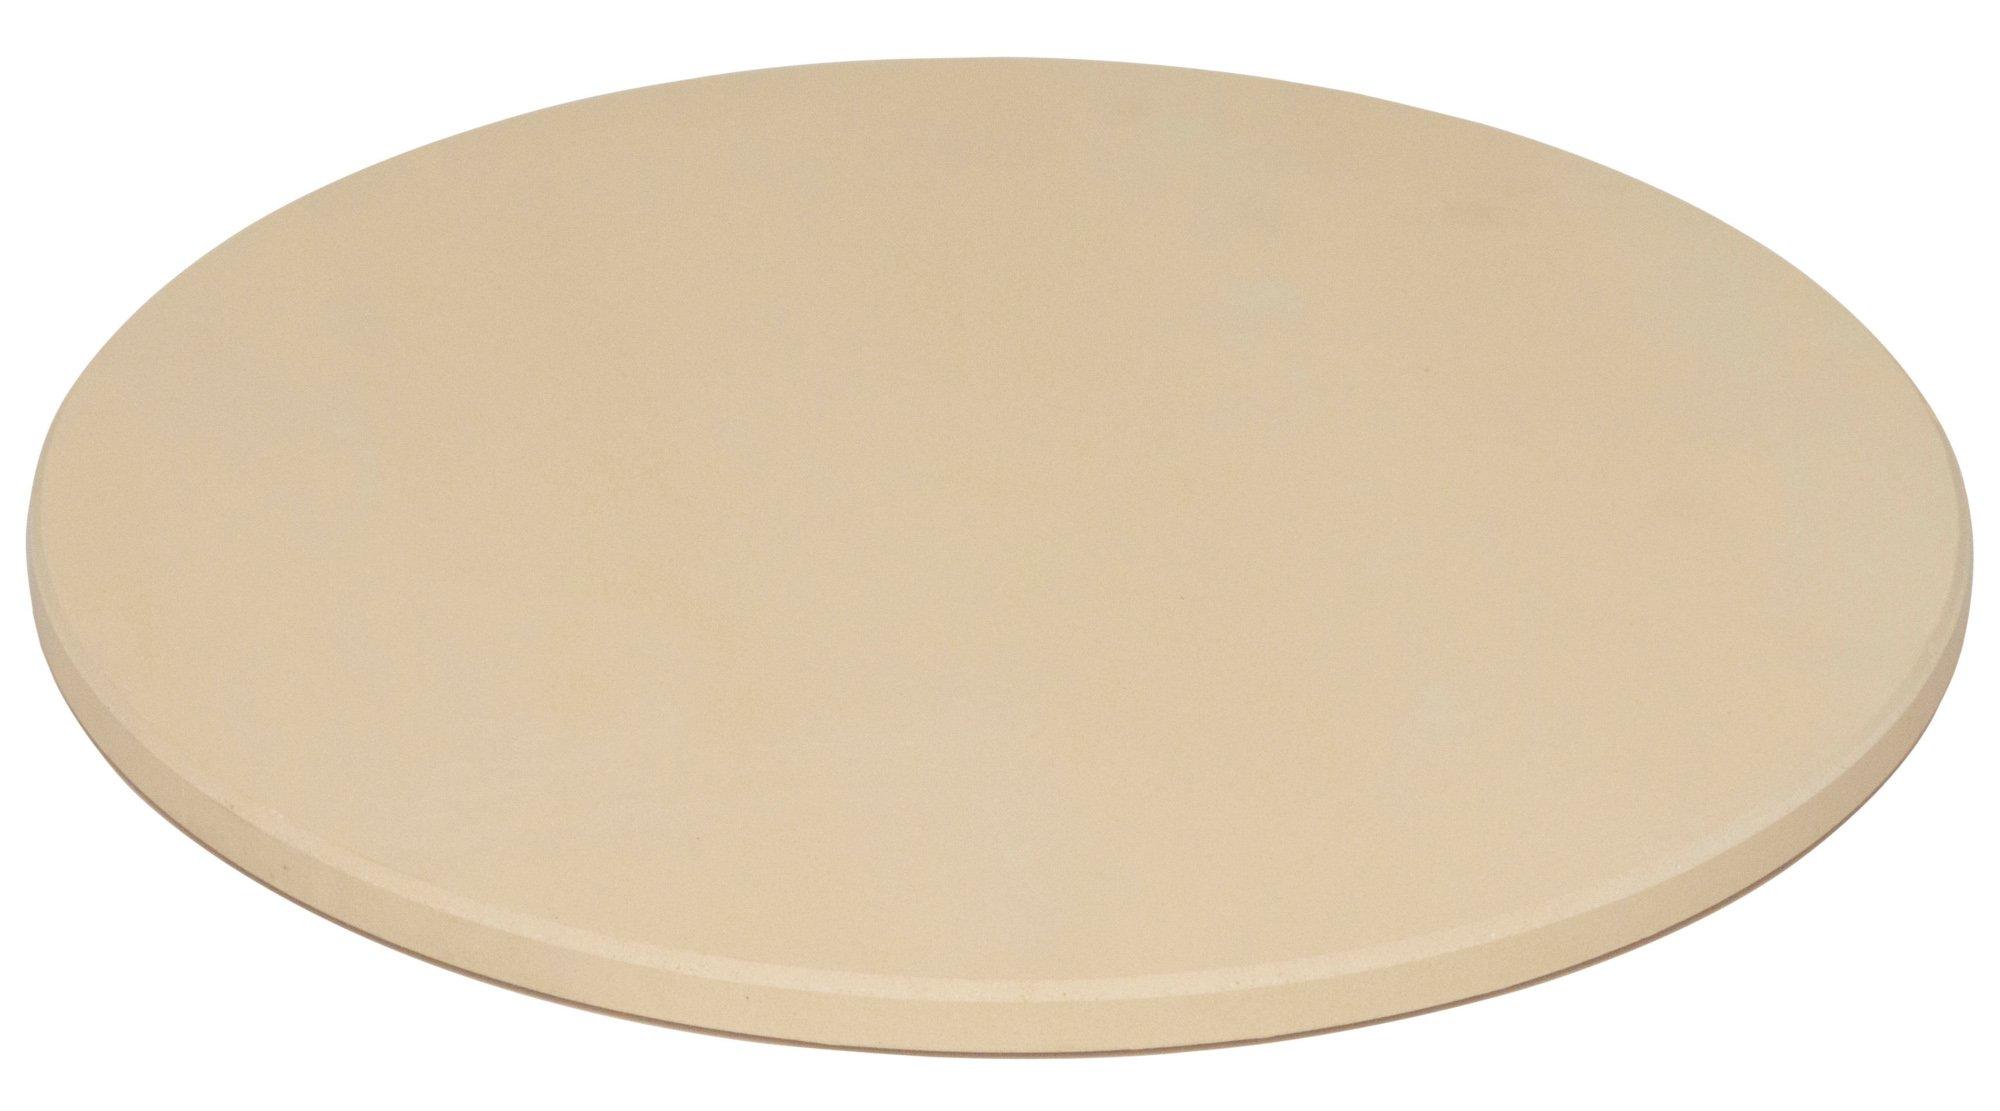 Saffire Grills SGES-FS16 XL Fire/Pizza Stone, 23'', Ceramic by Saffire Grills